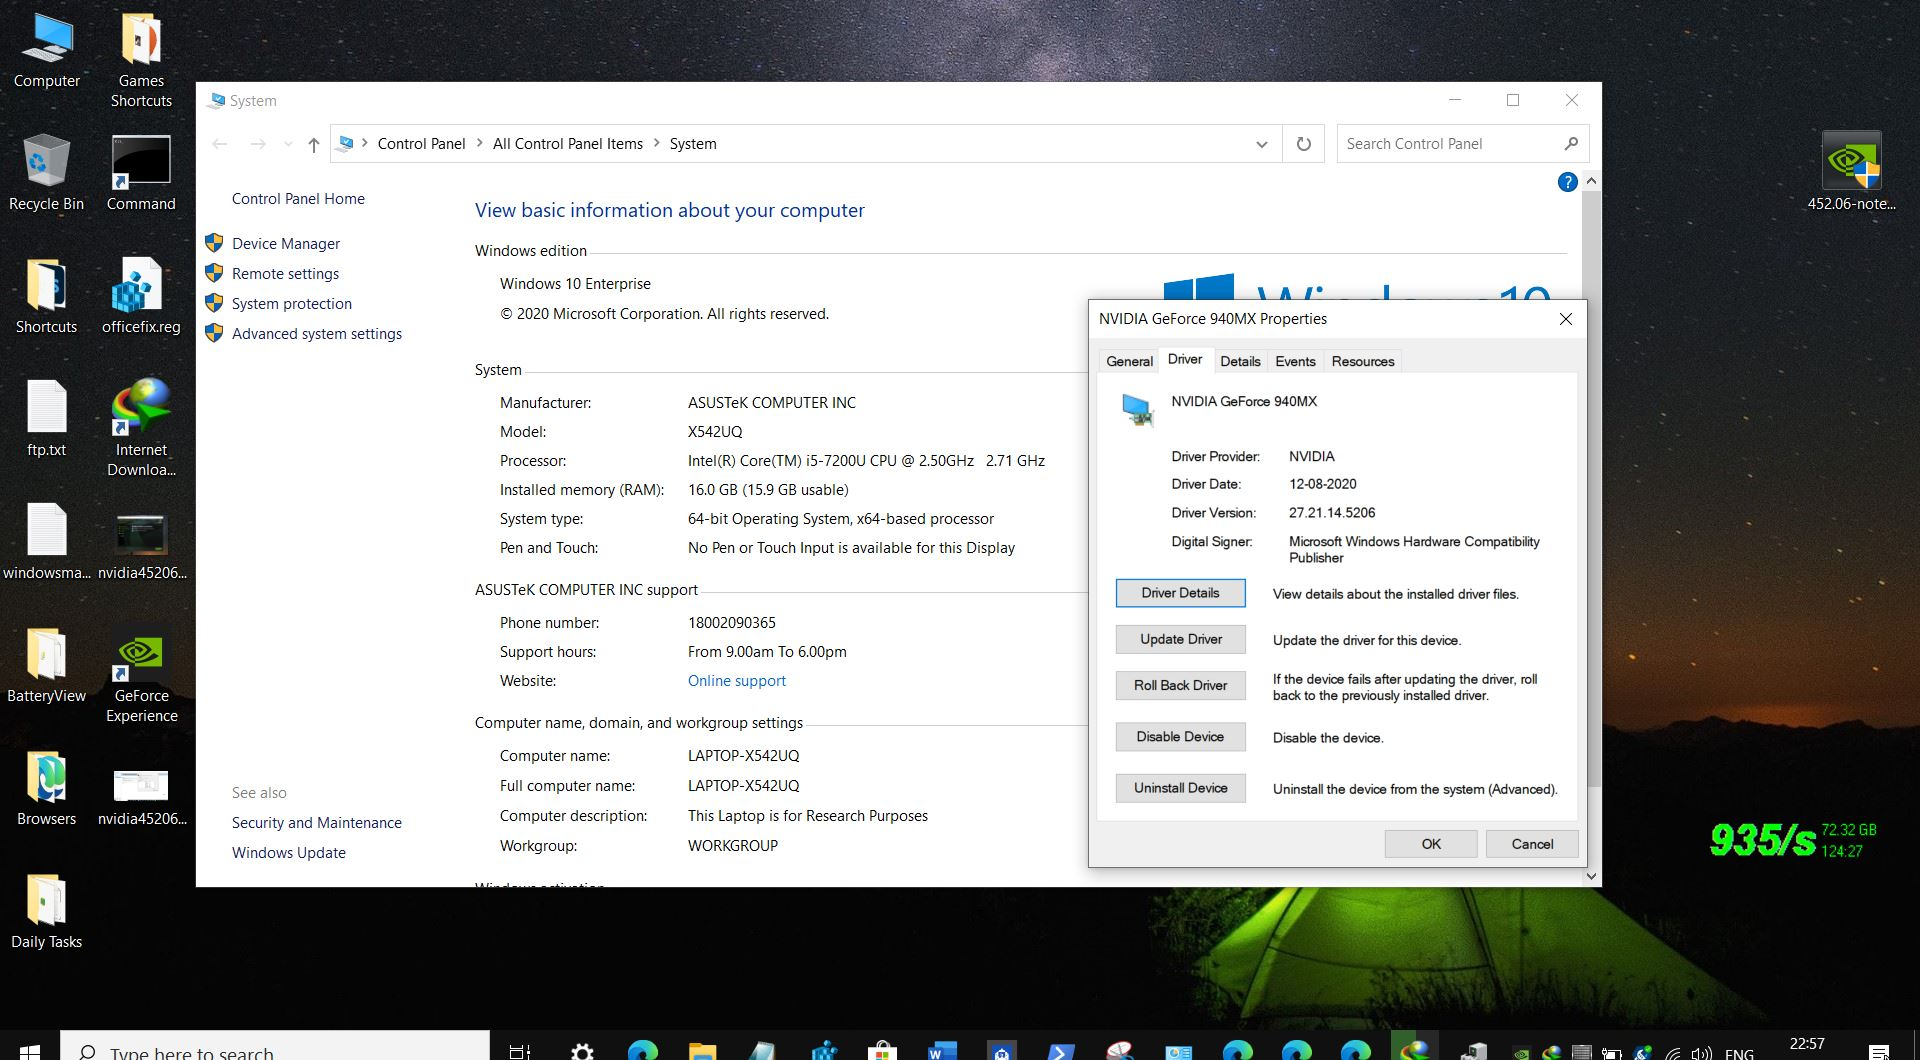 Nvidia Inc Released new Geforce DCH & STANDARD WHQL Driver v452.06 for Notebooks GPU'S &... f9d736a9-8714-4186-b282-6275a3bb1c6b?upload=true.jpg